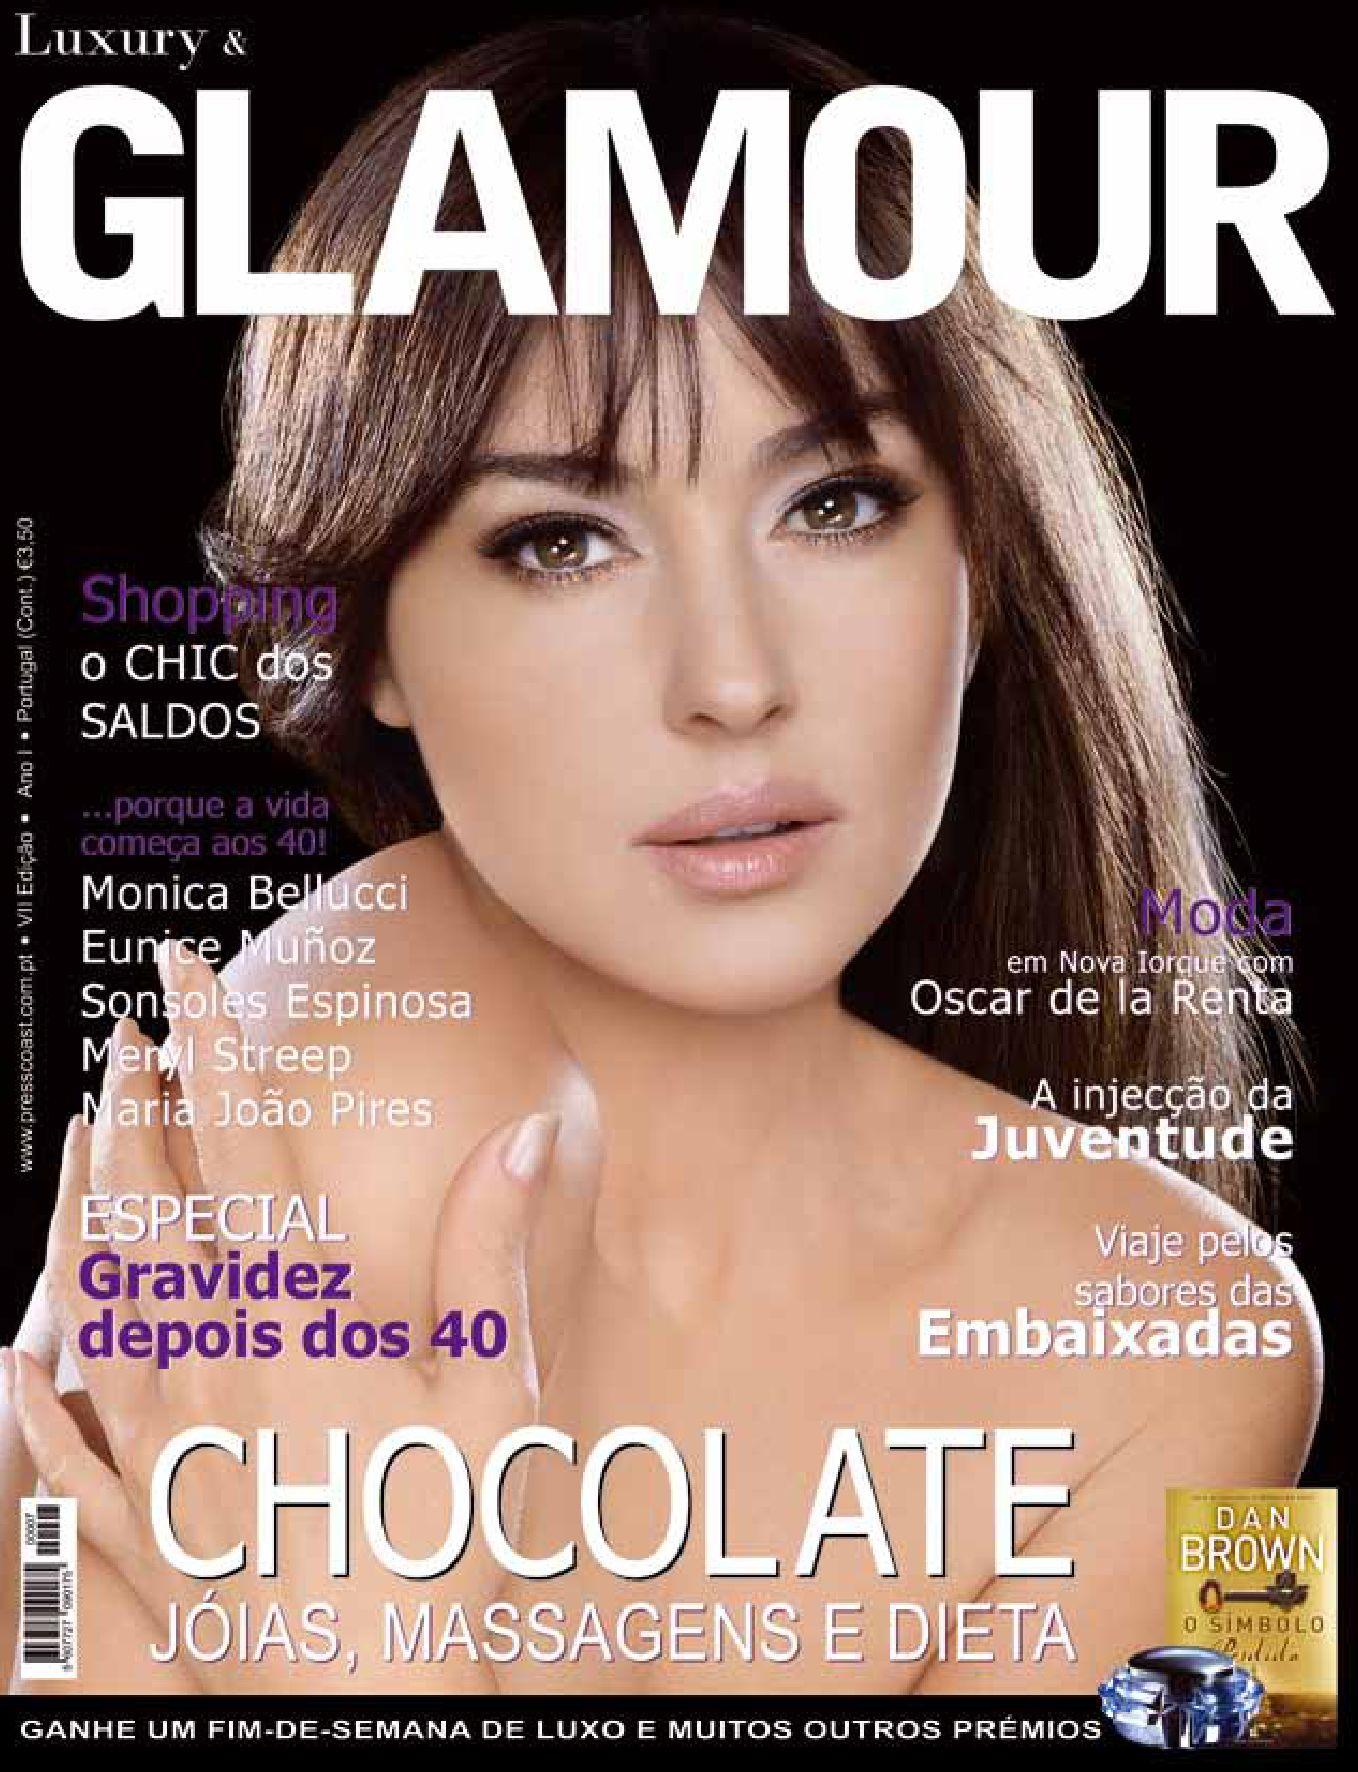 Luxury   Glamour 7 by Press Coast - issuu 85ad7a61d3